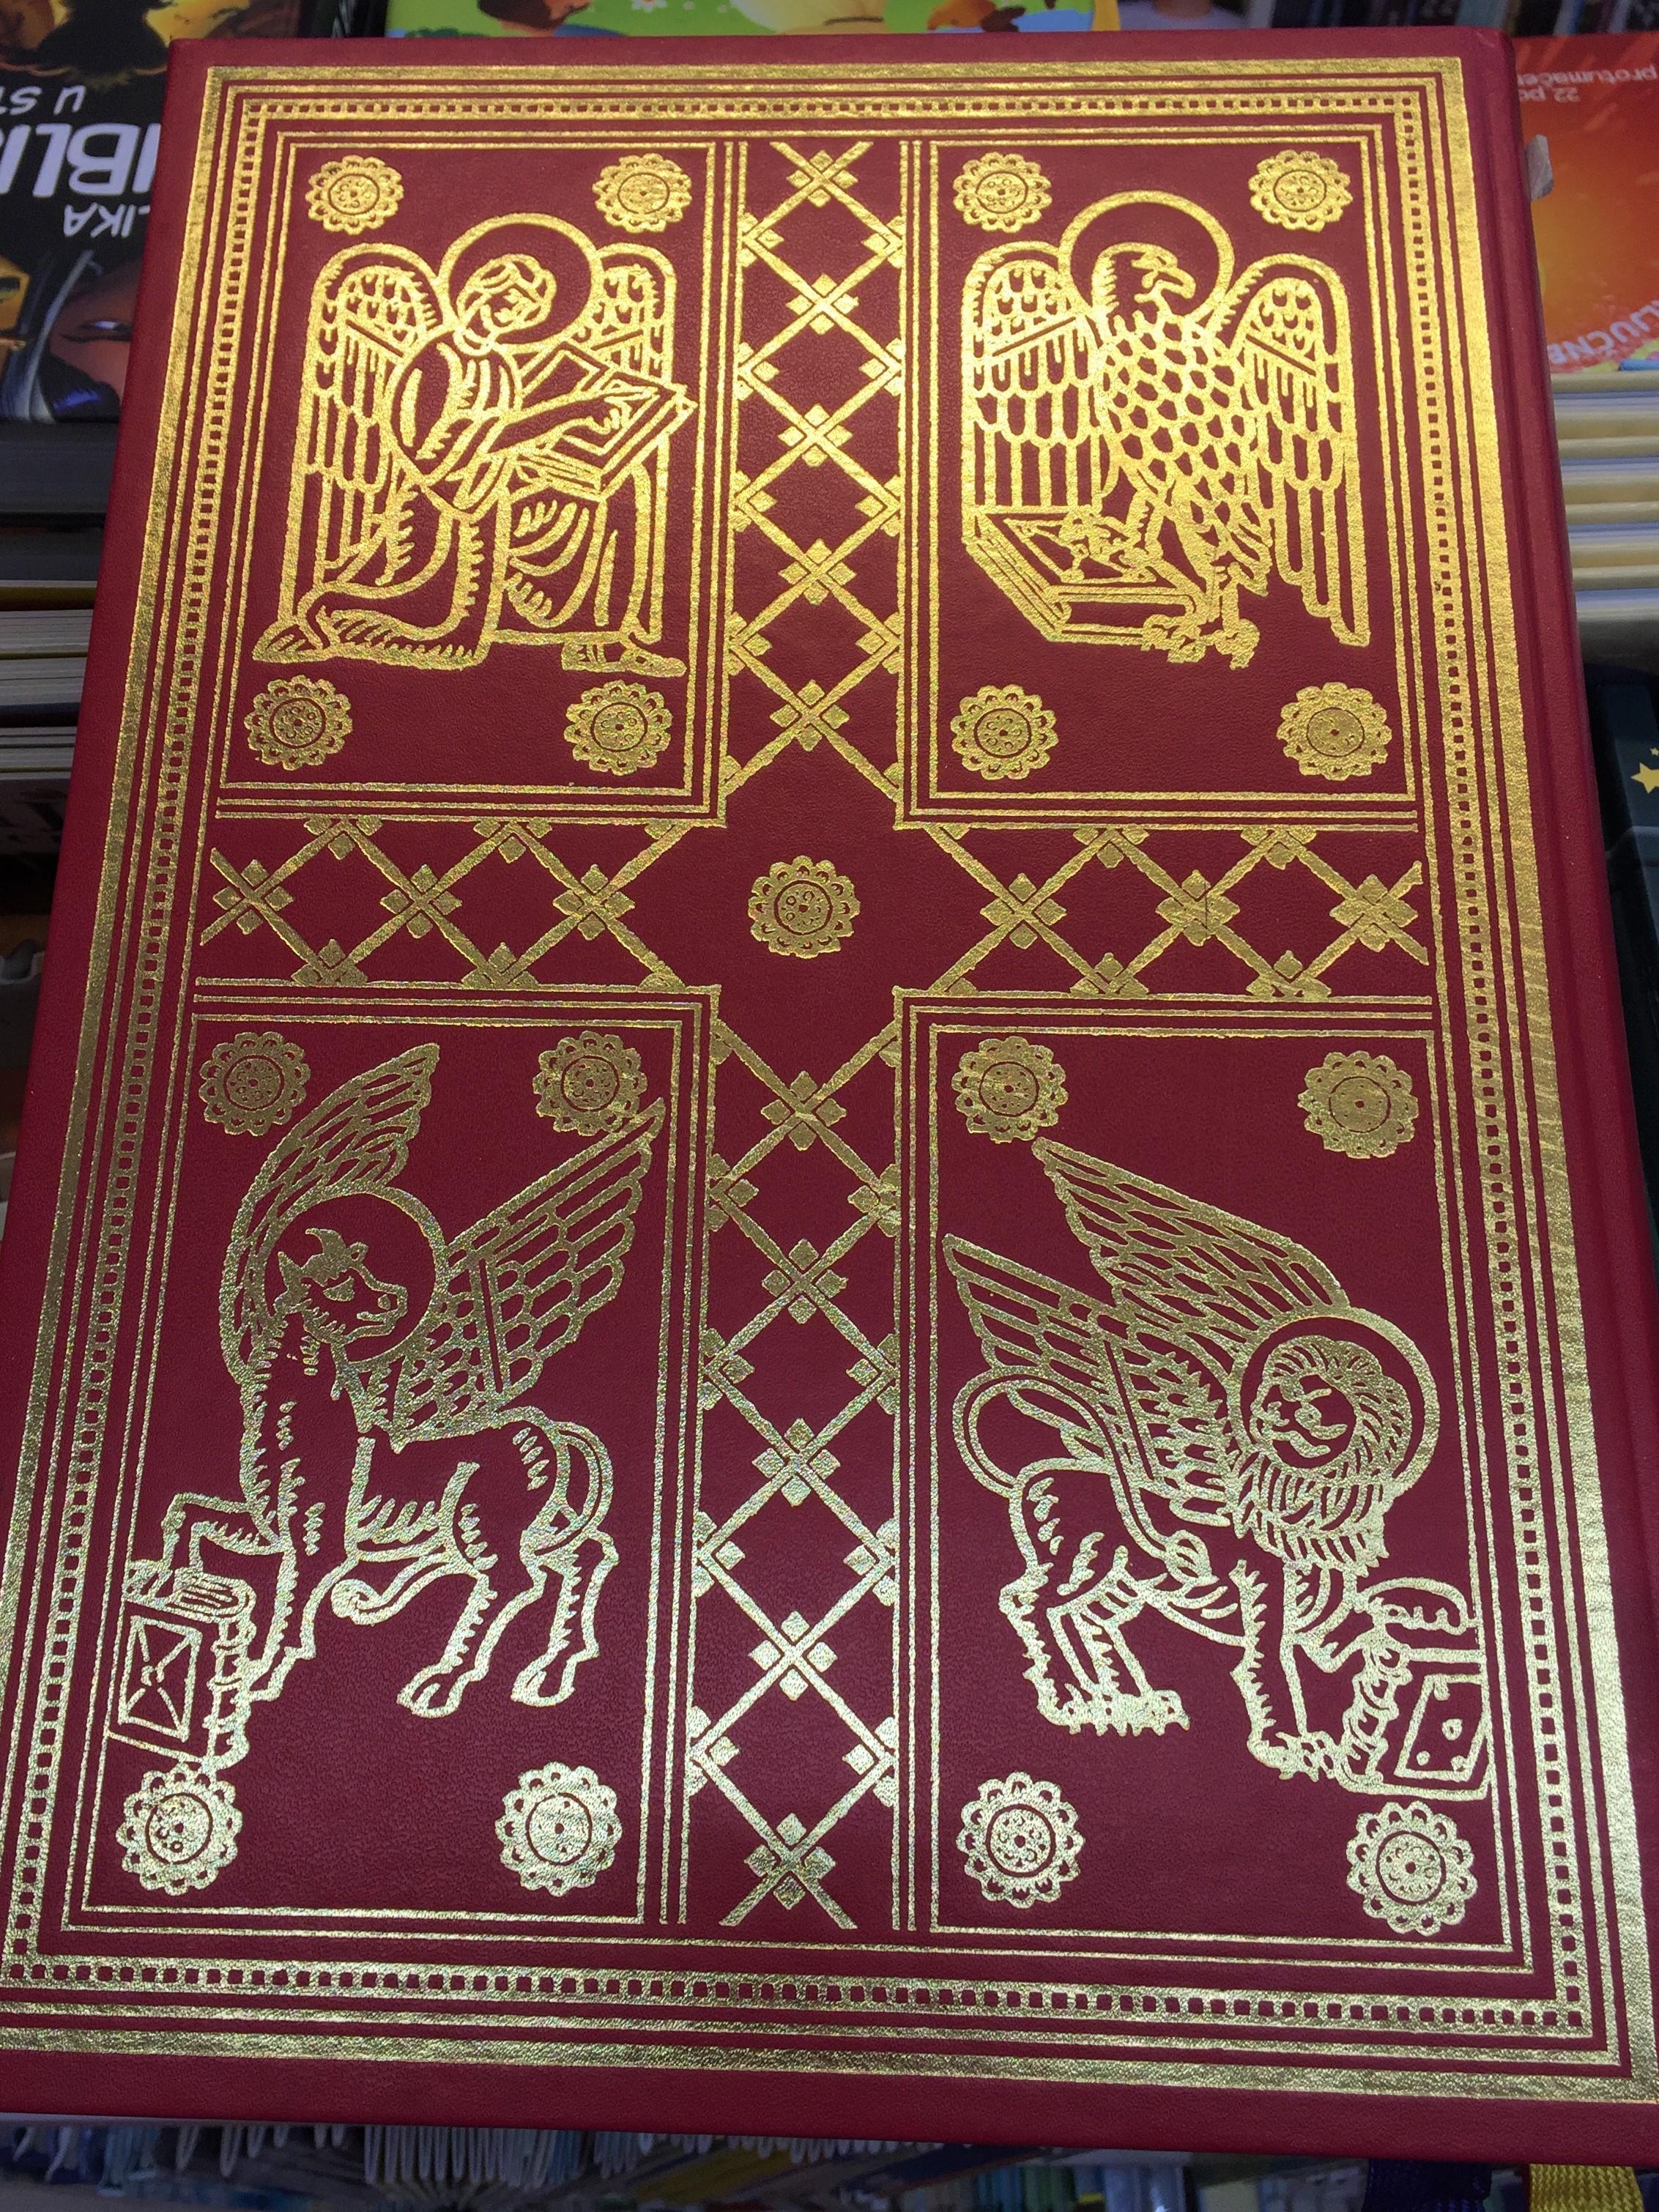 -evan-elistar-i-etveroevan-elje-rimski-misal-croatian-language-roman-missal-the-4-gospels-21.jpg